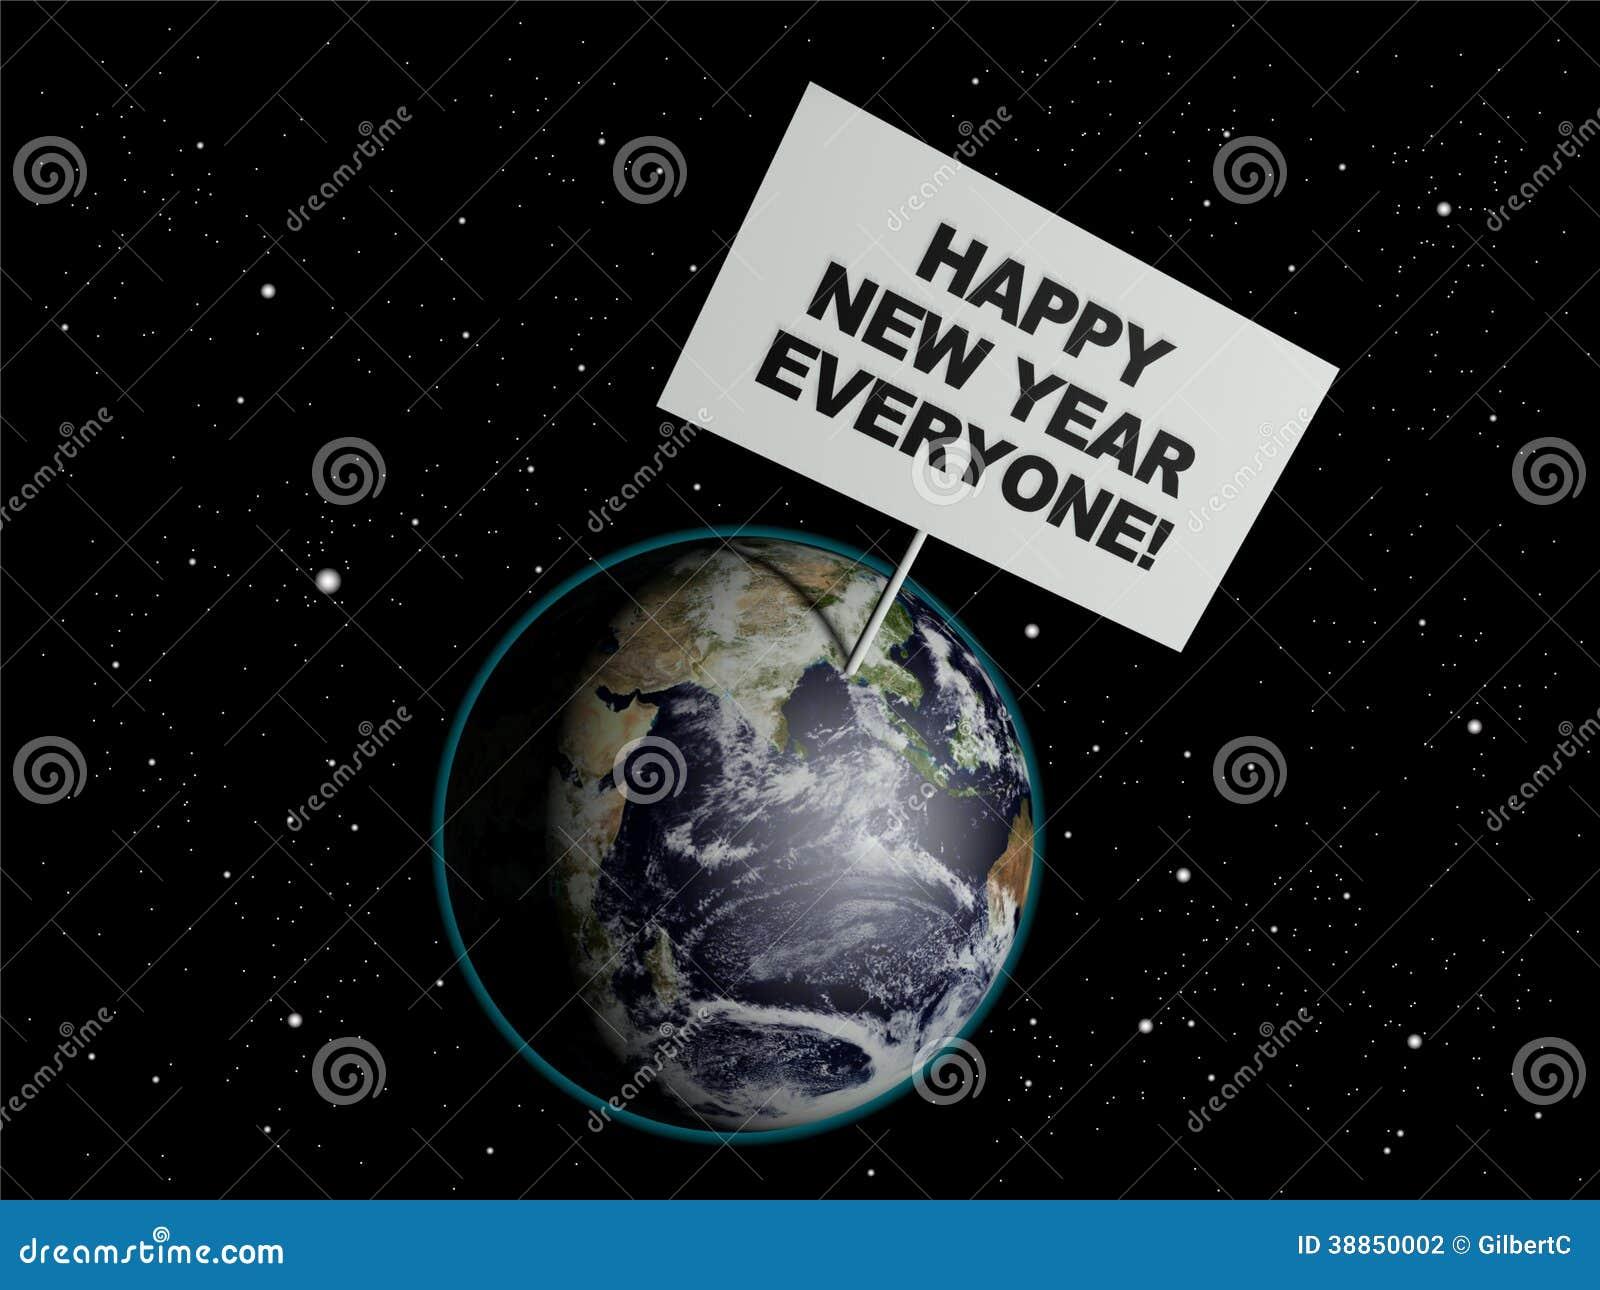 Happy New Year Everyone 50